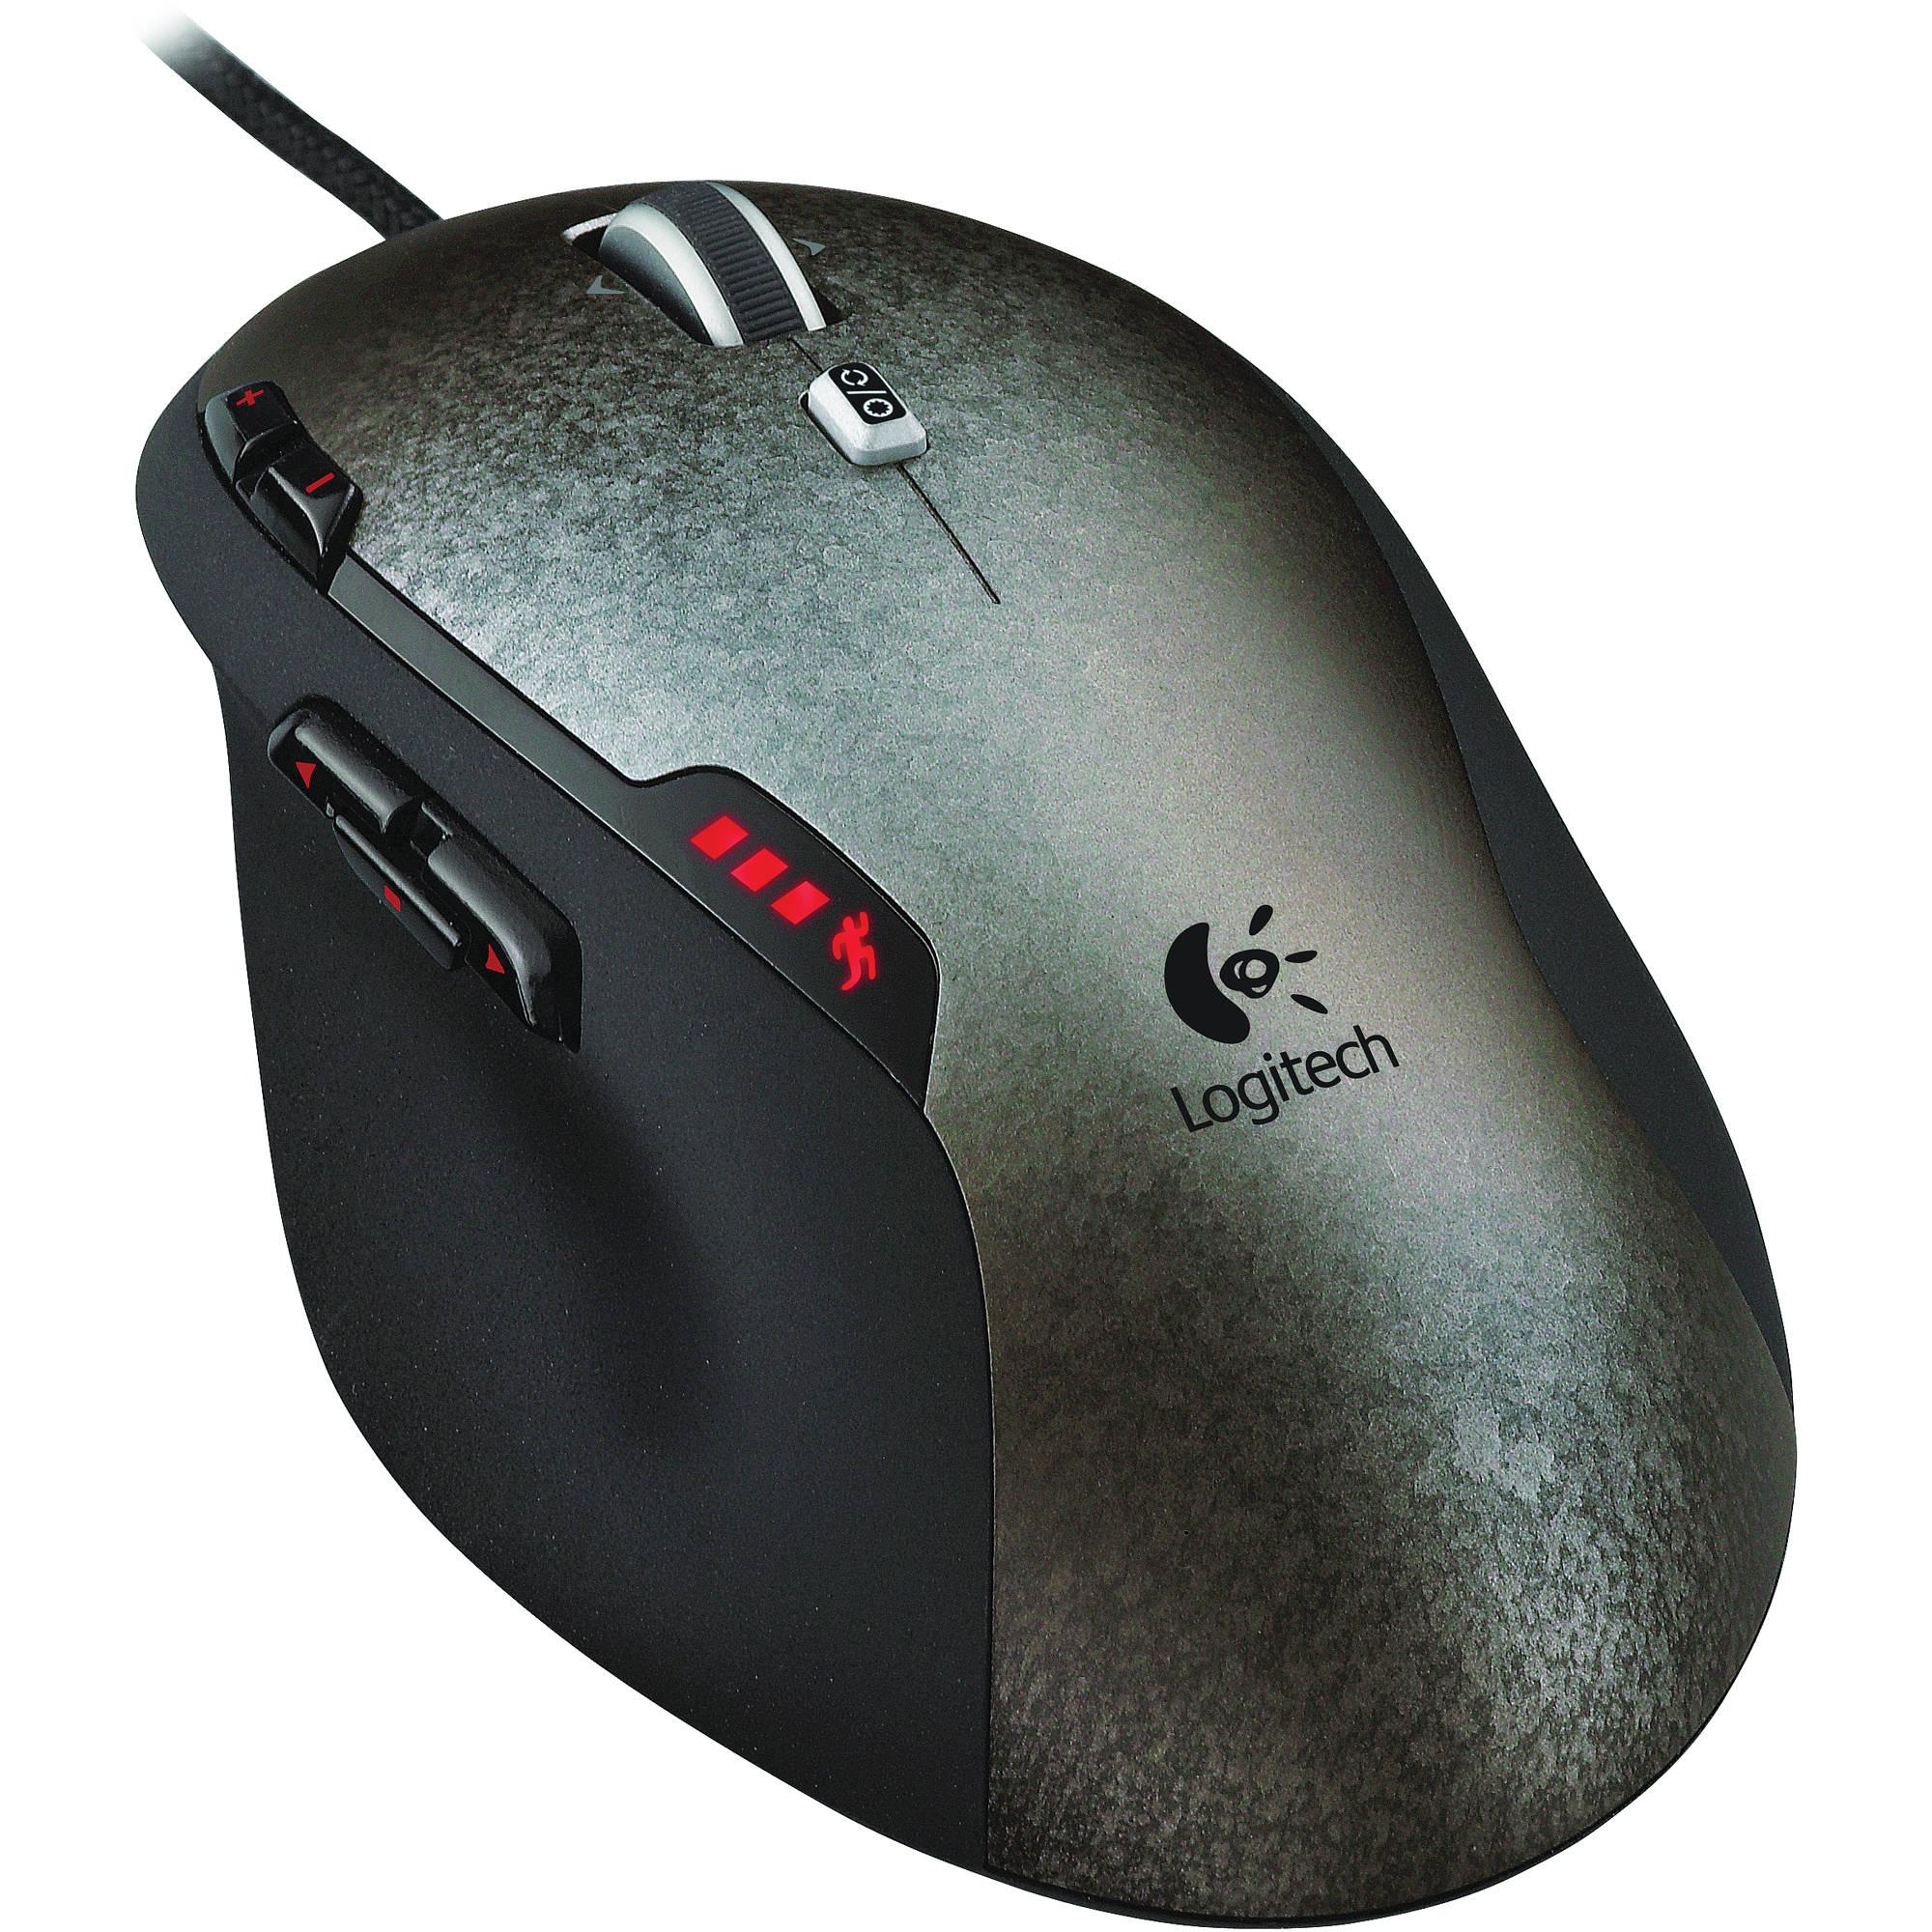 Logitech Gaming Mouse G500 910-001259 B&H Photo Video